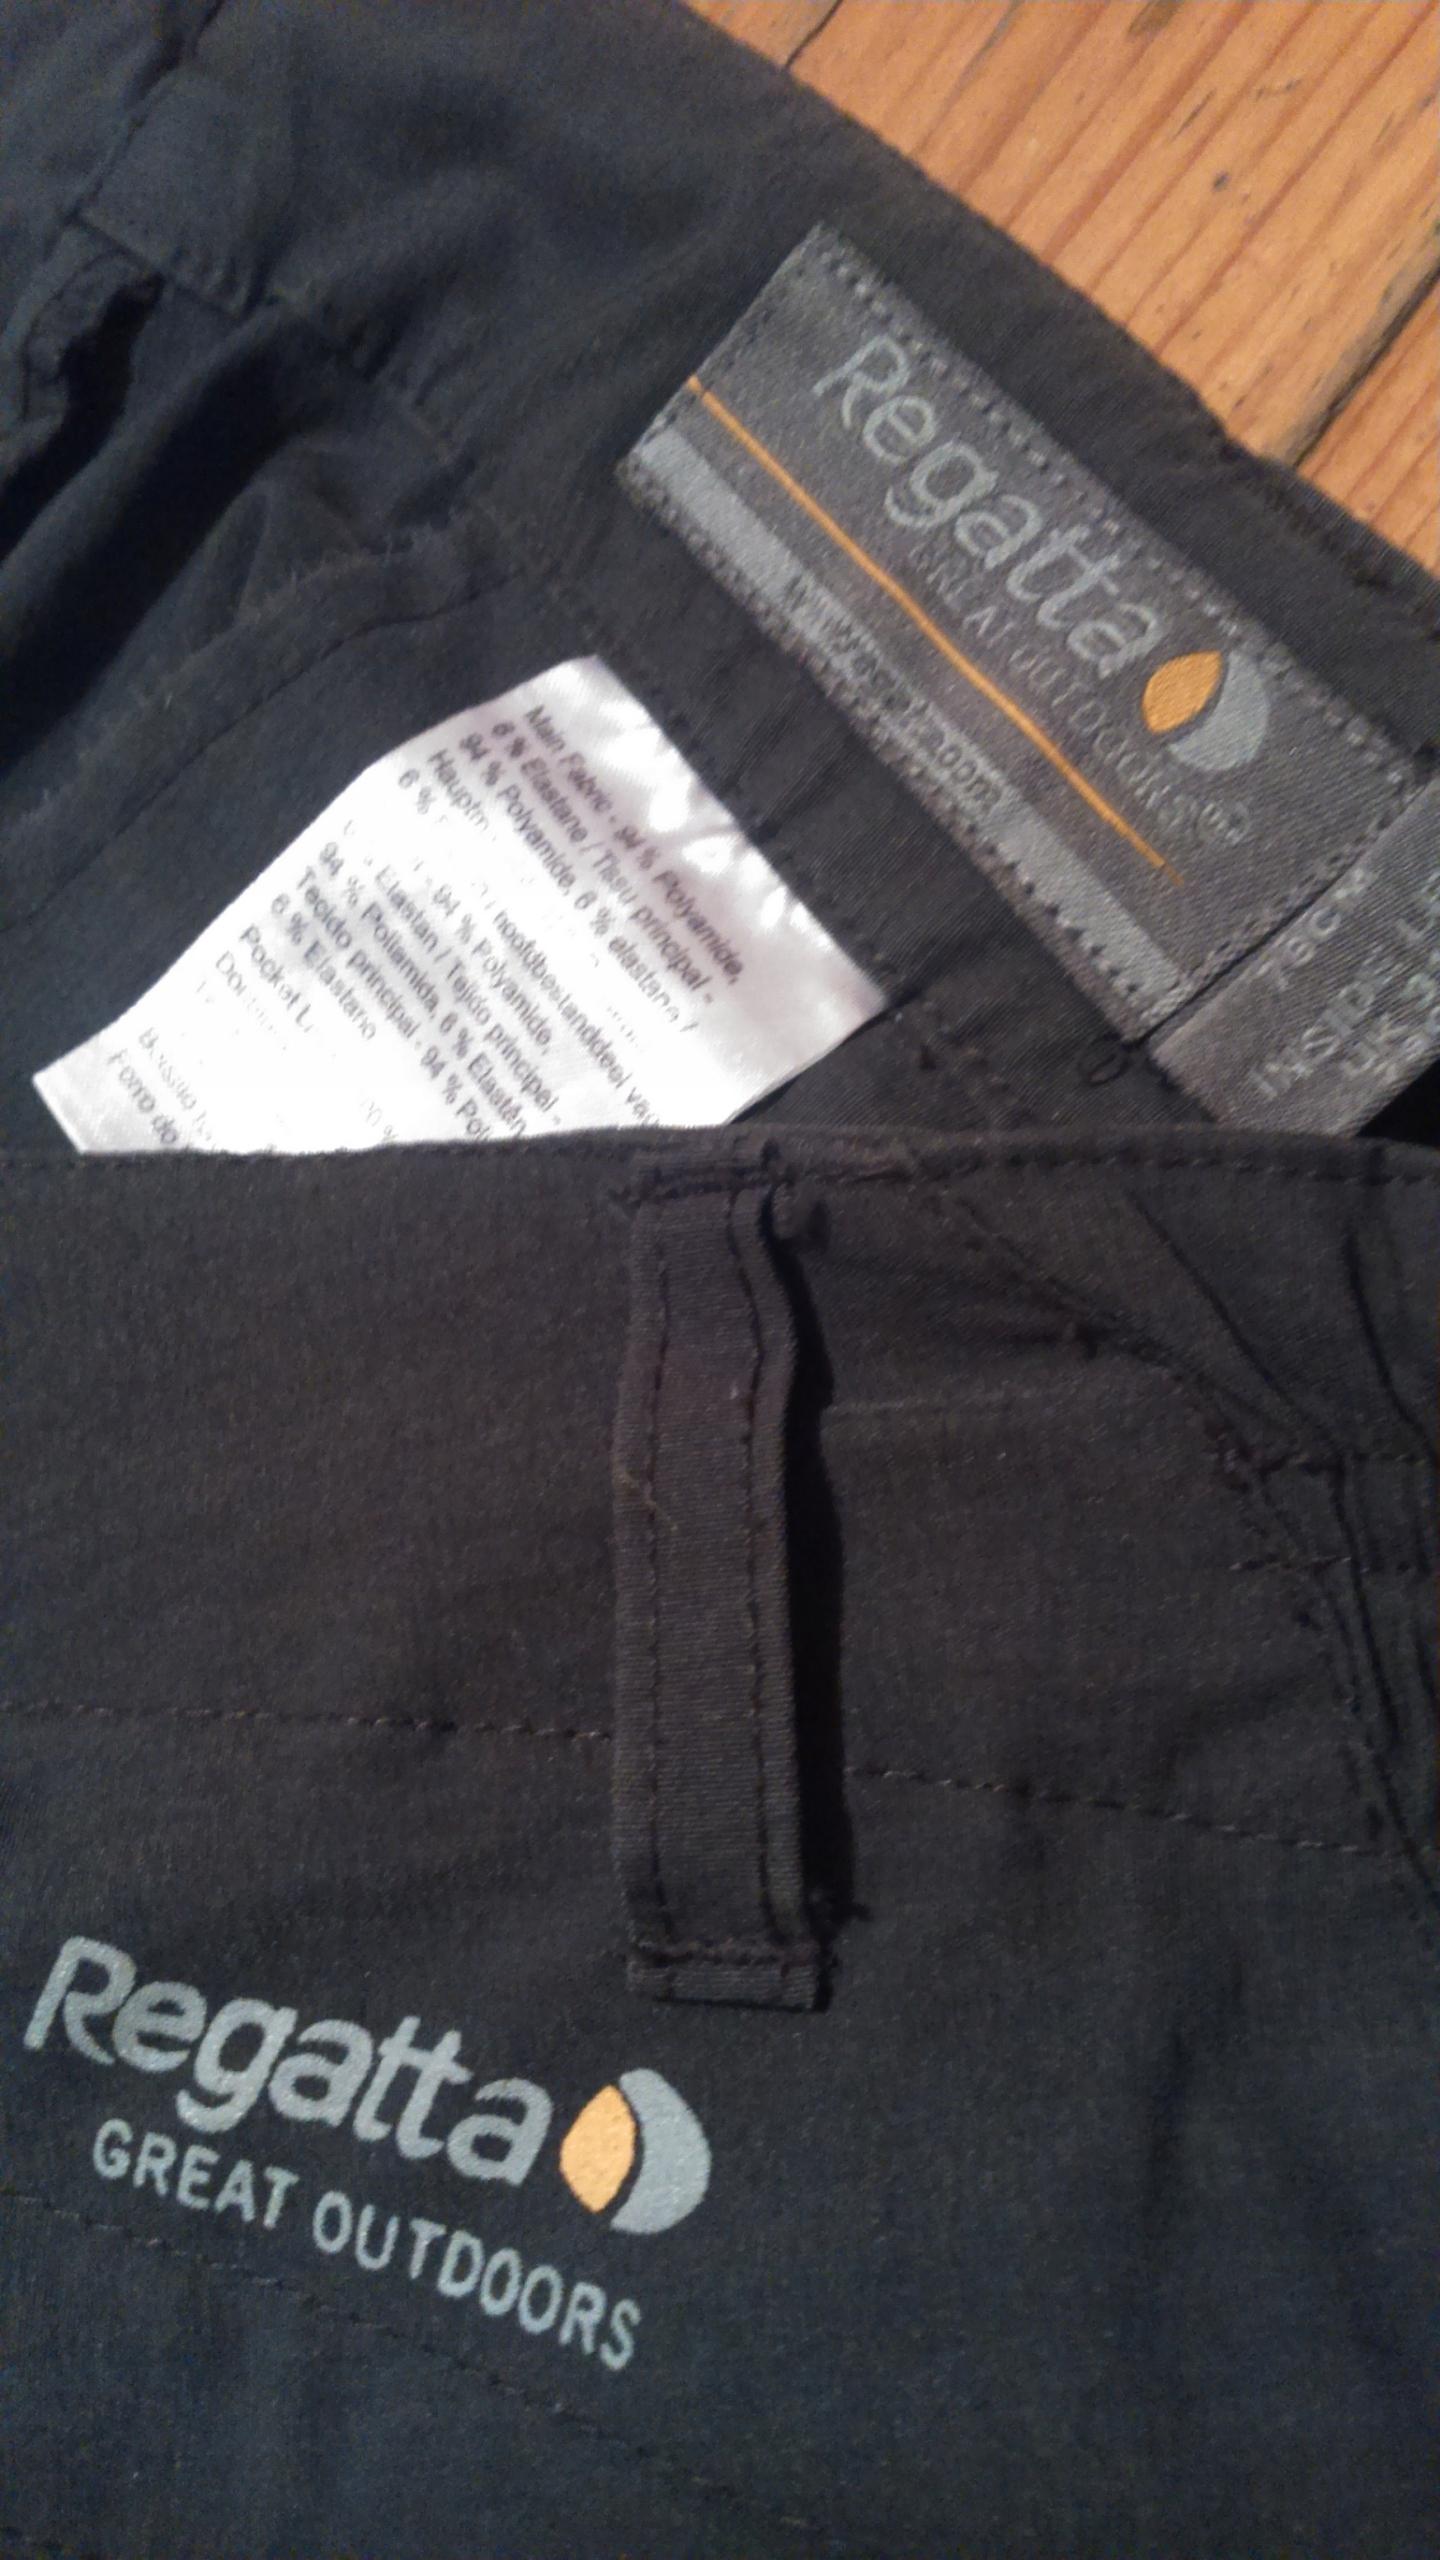 Regatta Spodnie trekingowe - okazja !!!